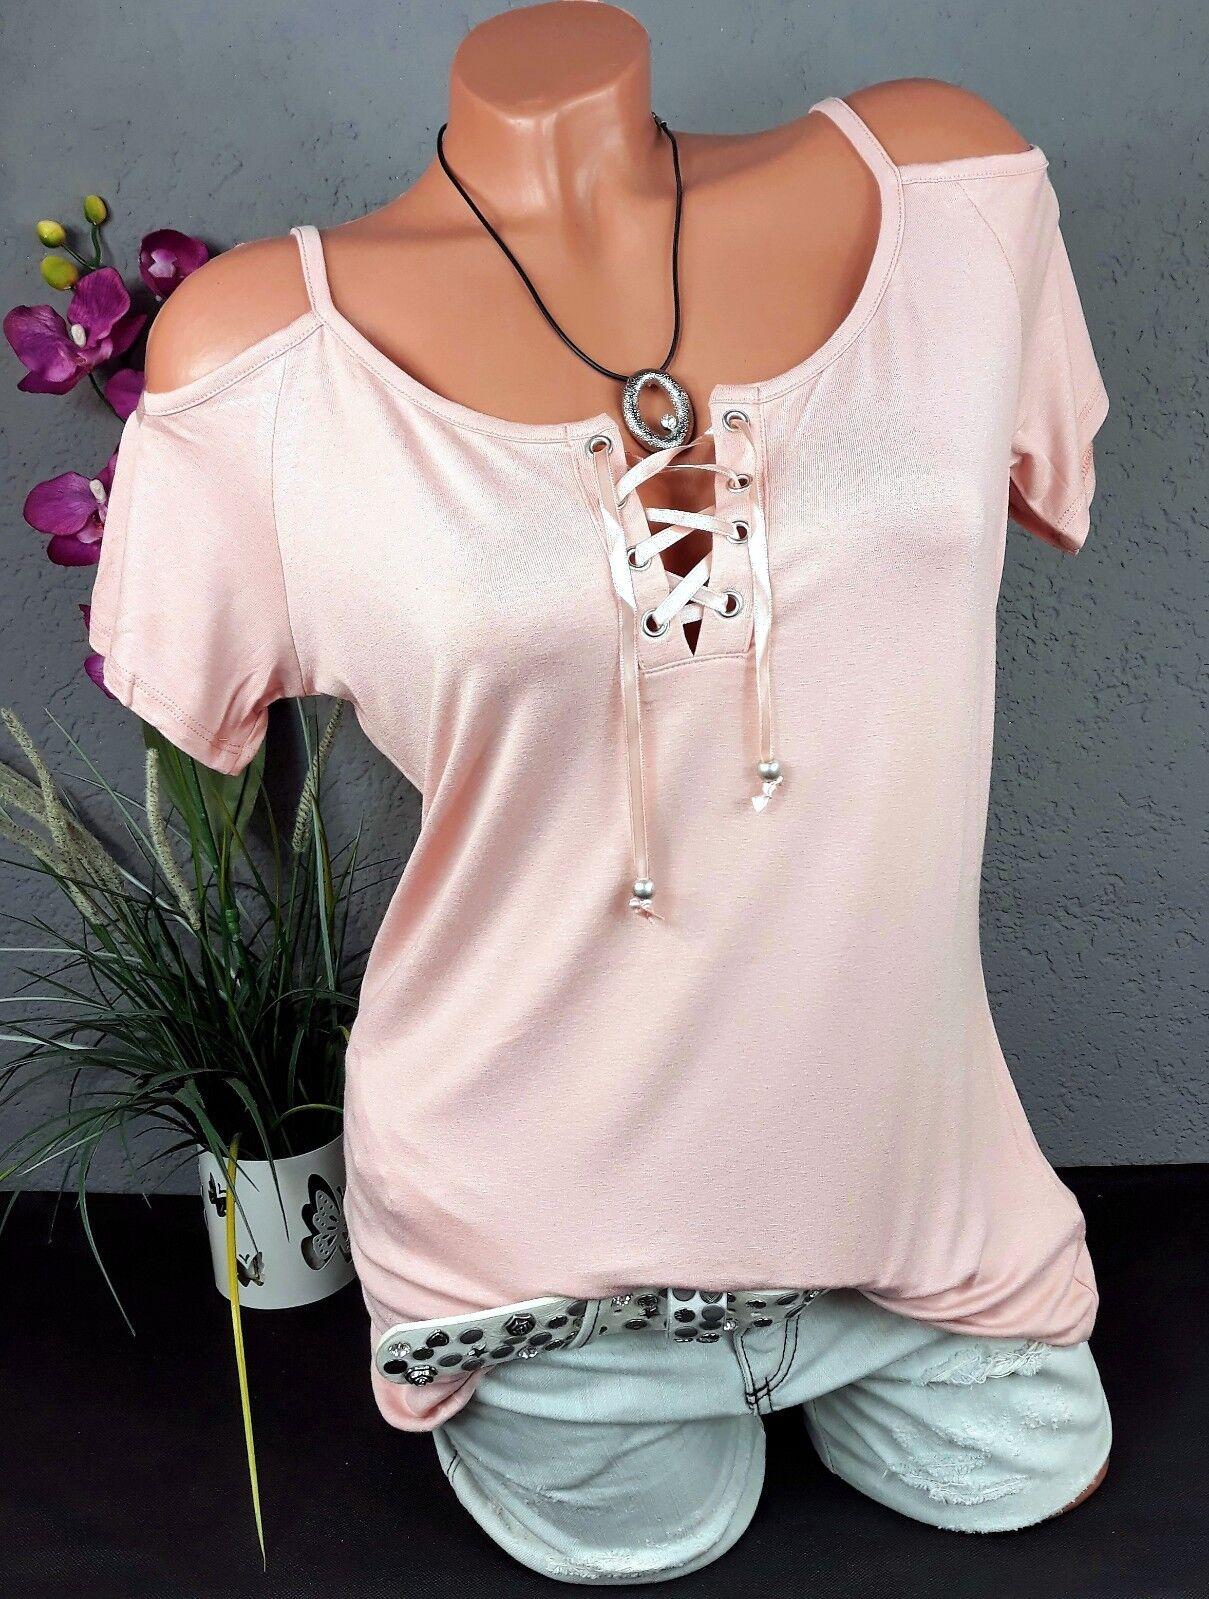 Melrose - Schulter Cut-Outs Shirt Bluse Off-Shoulder in rosa Gr. 40